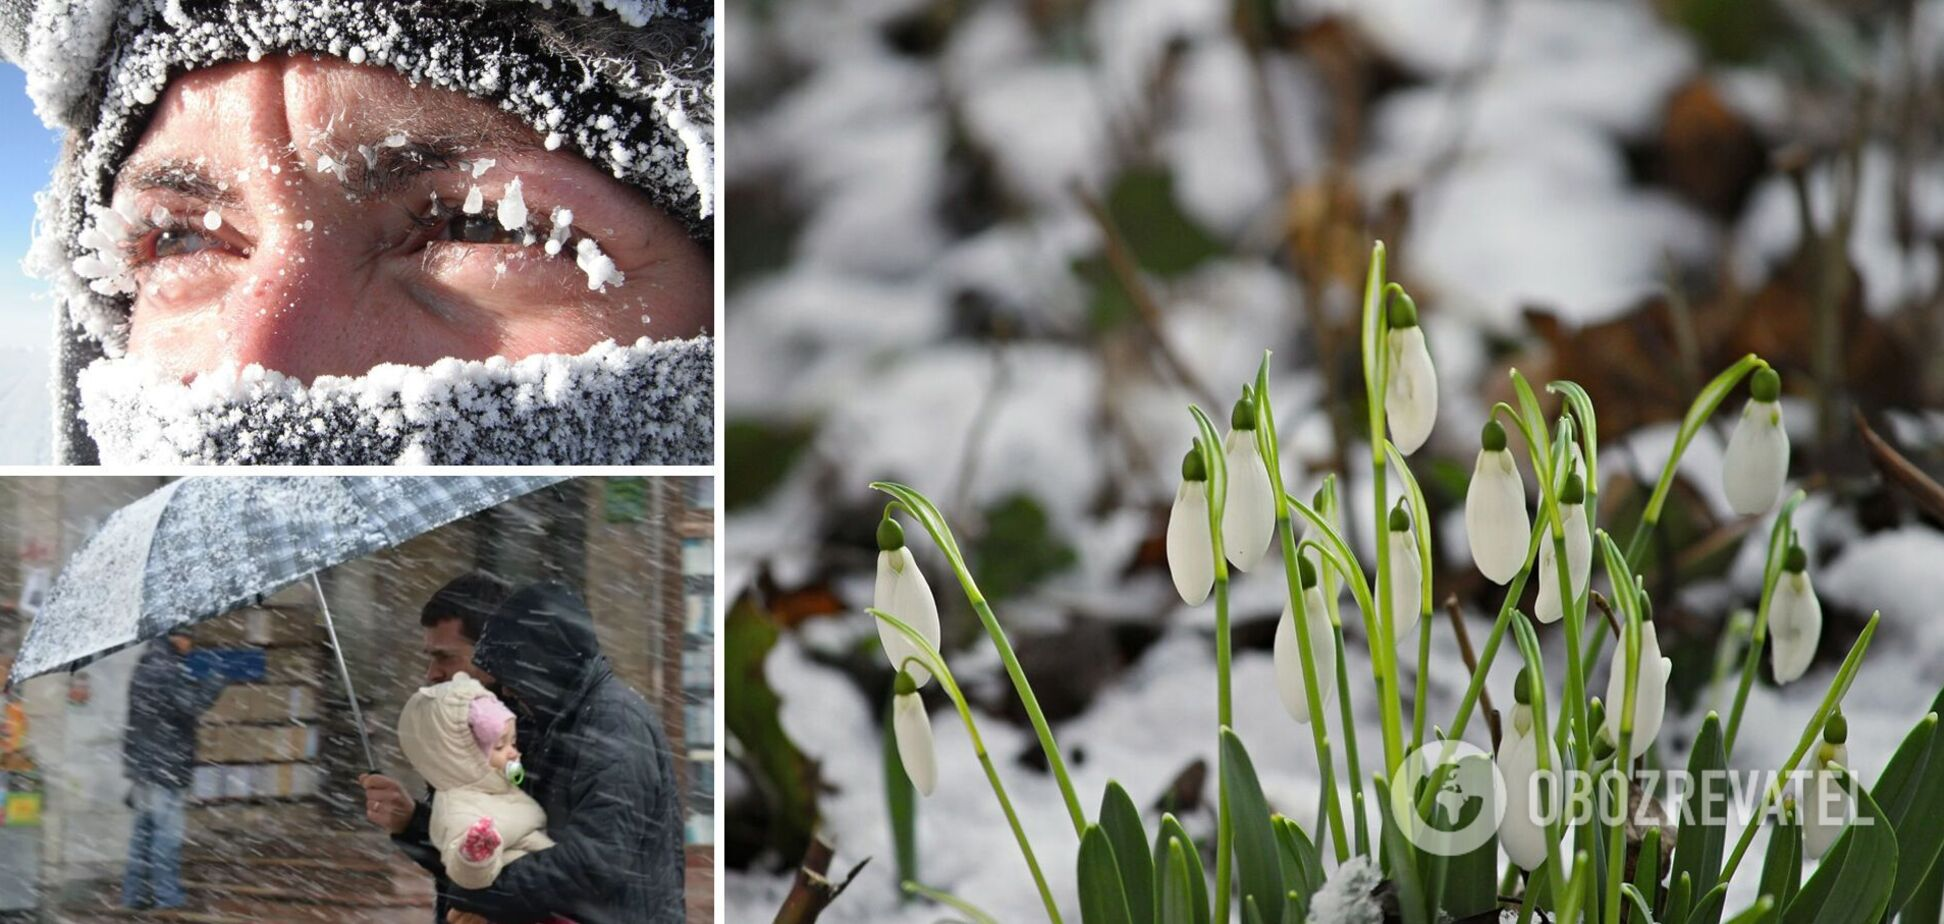 В Україну йдуть холоди й дощі, ранньої весни не буде: синоптики уточнили прогноз погоди